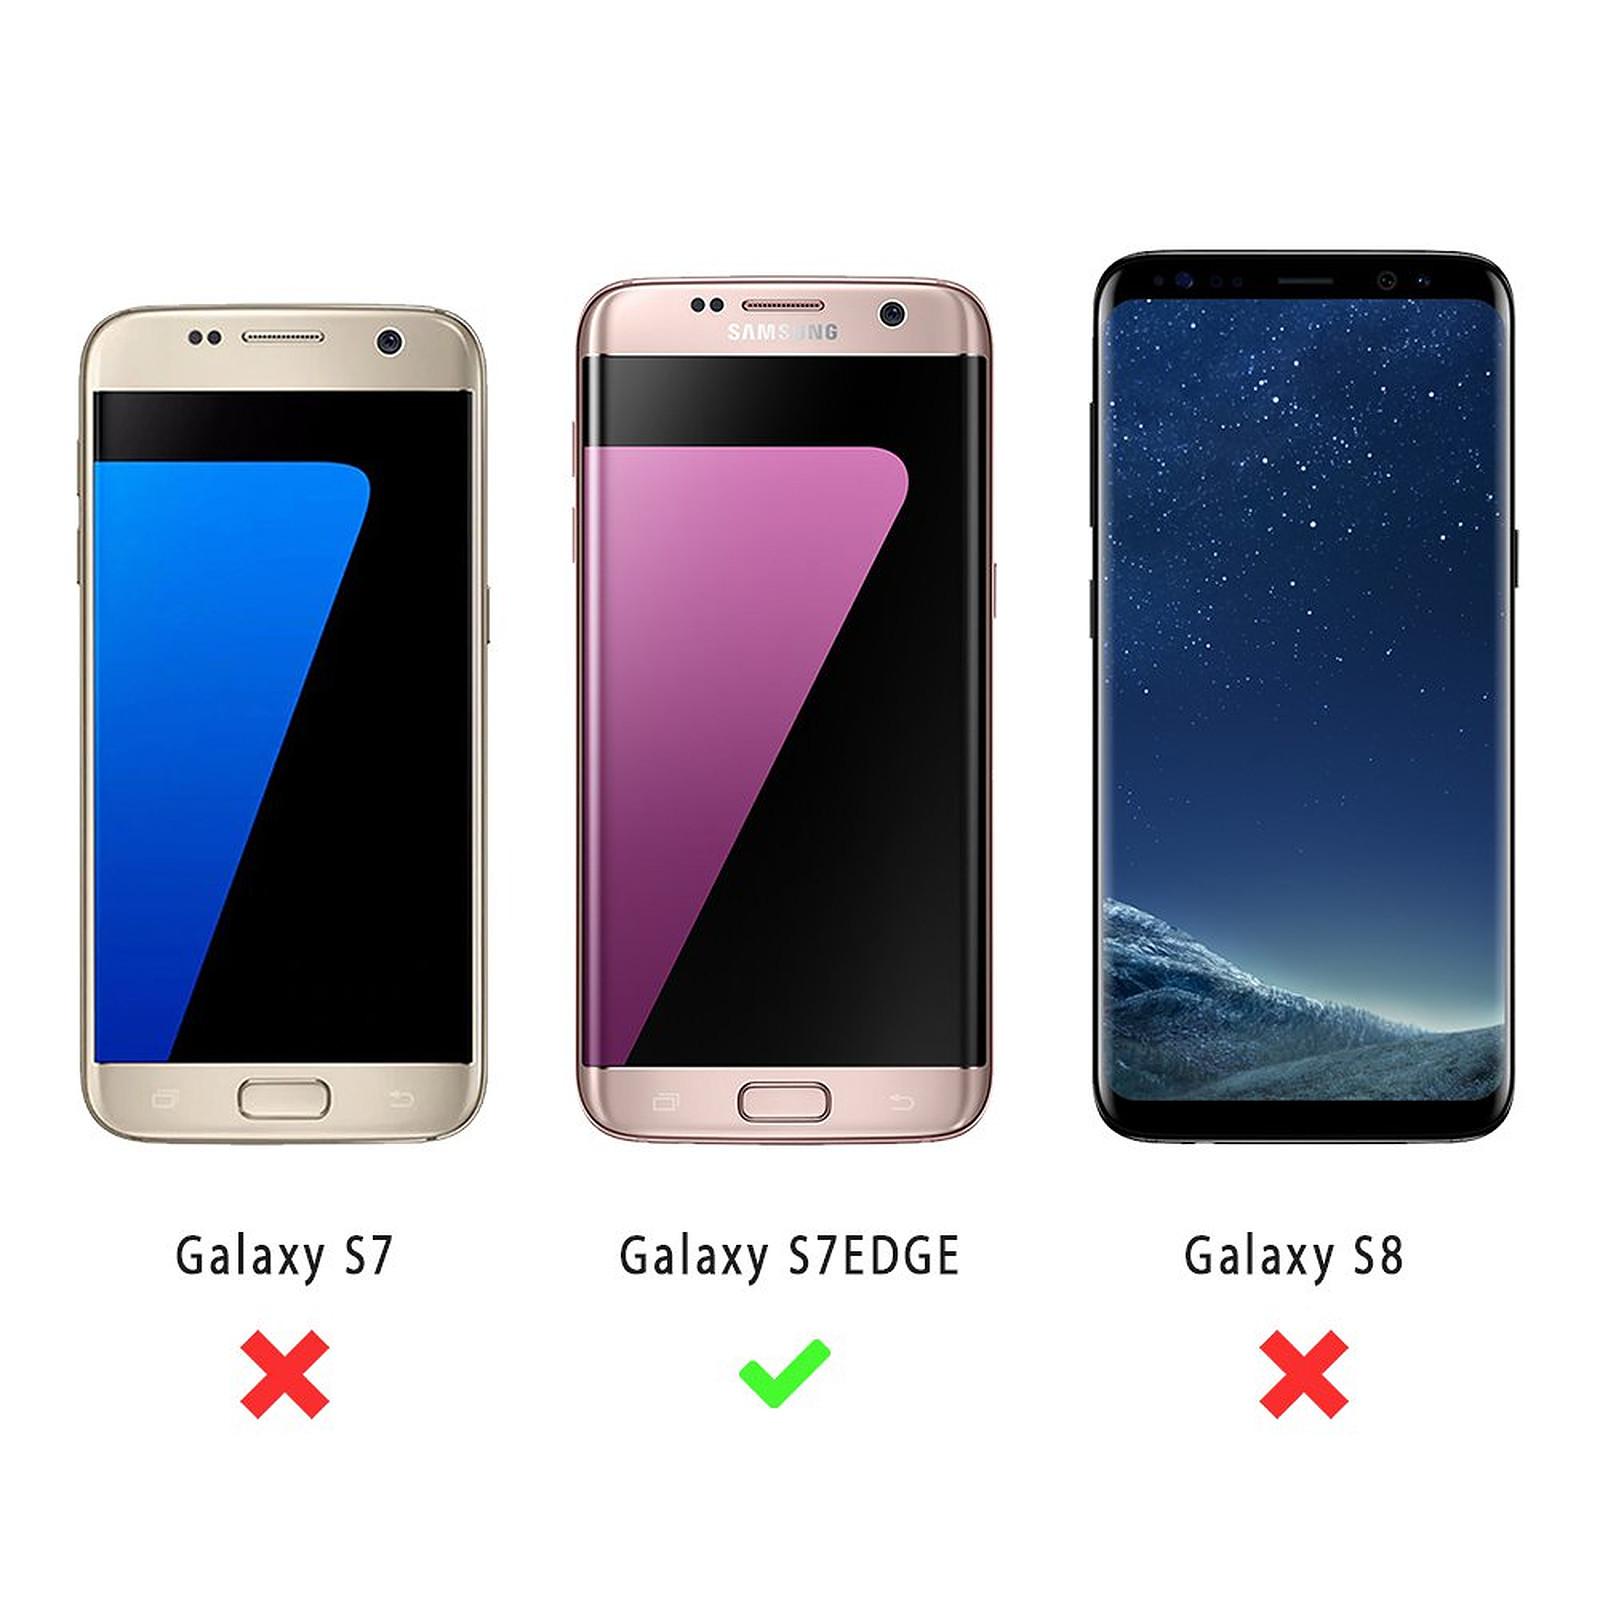 EVETANE Coque Samsung Galaxy S7 Edge anti-choc souple angles renforcés transparente Marguerite